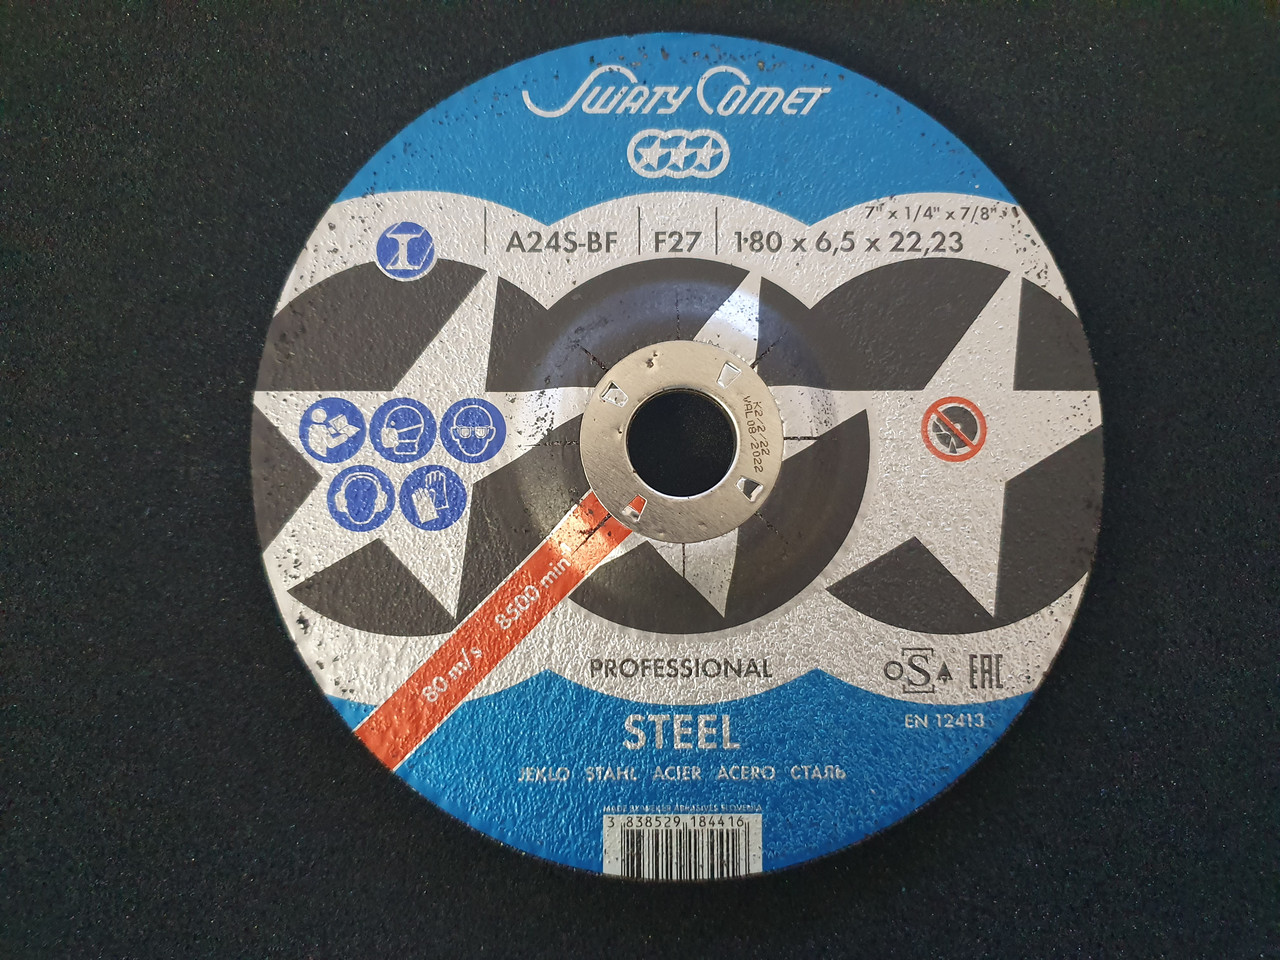 Круг шлифовальный 125 х 6,5 х 22,23 мм. SwatyComet PROFESSIONAL (Metal)